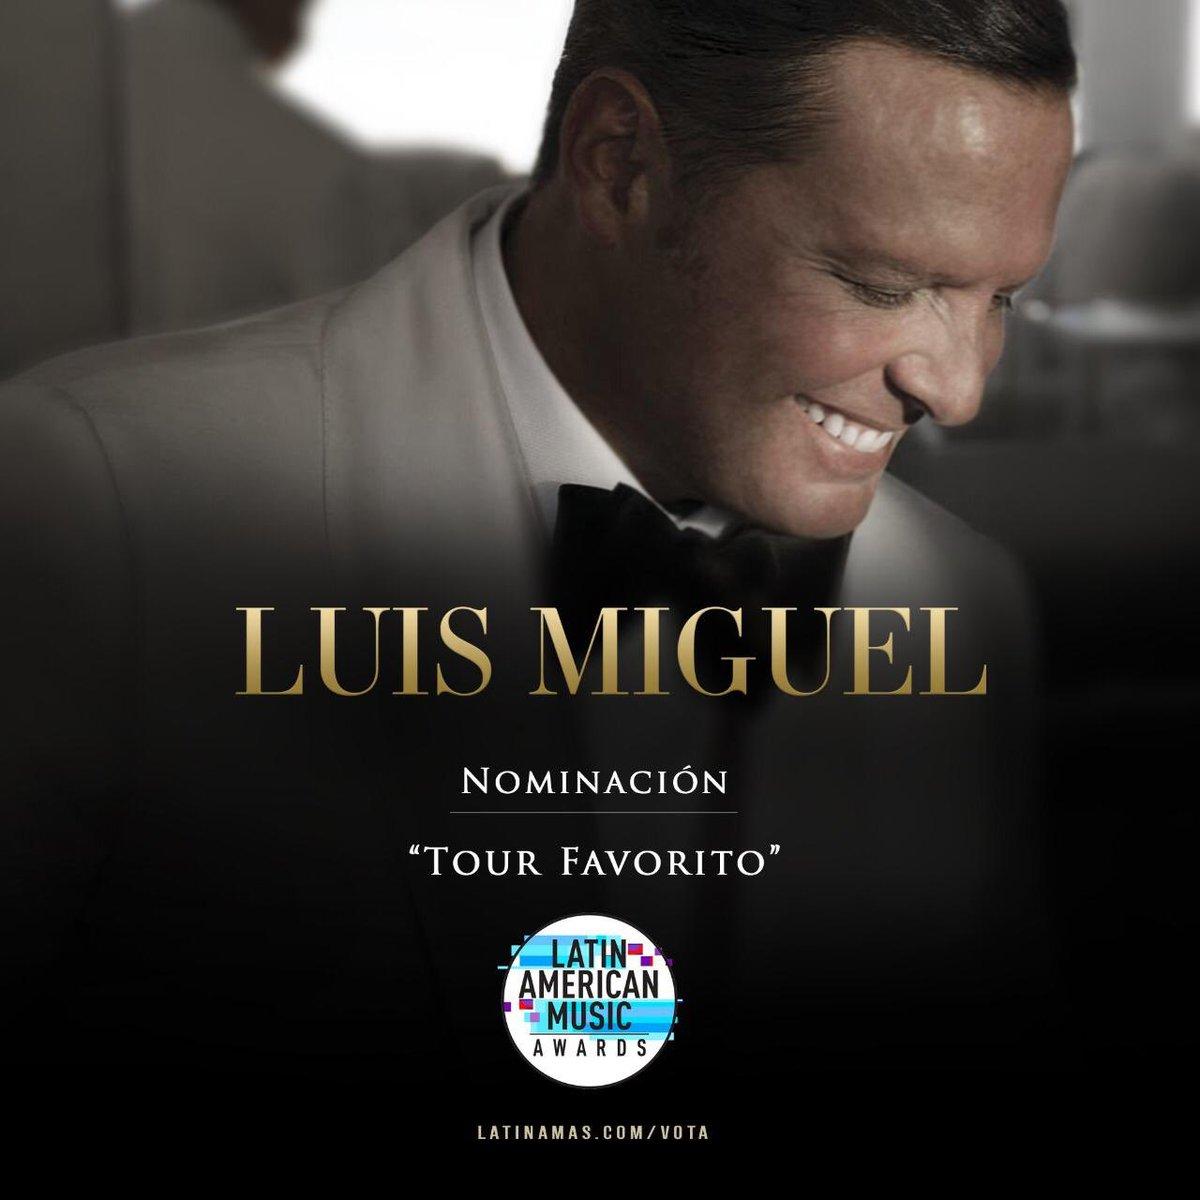 RT @LMXLM: Gracias @LatinAMAs por esta nominación para #LuisMiguelTour2019! #LatinAMAs https://t.co/4jxQNUf1mX